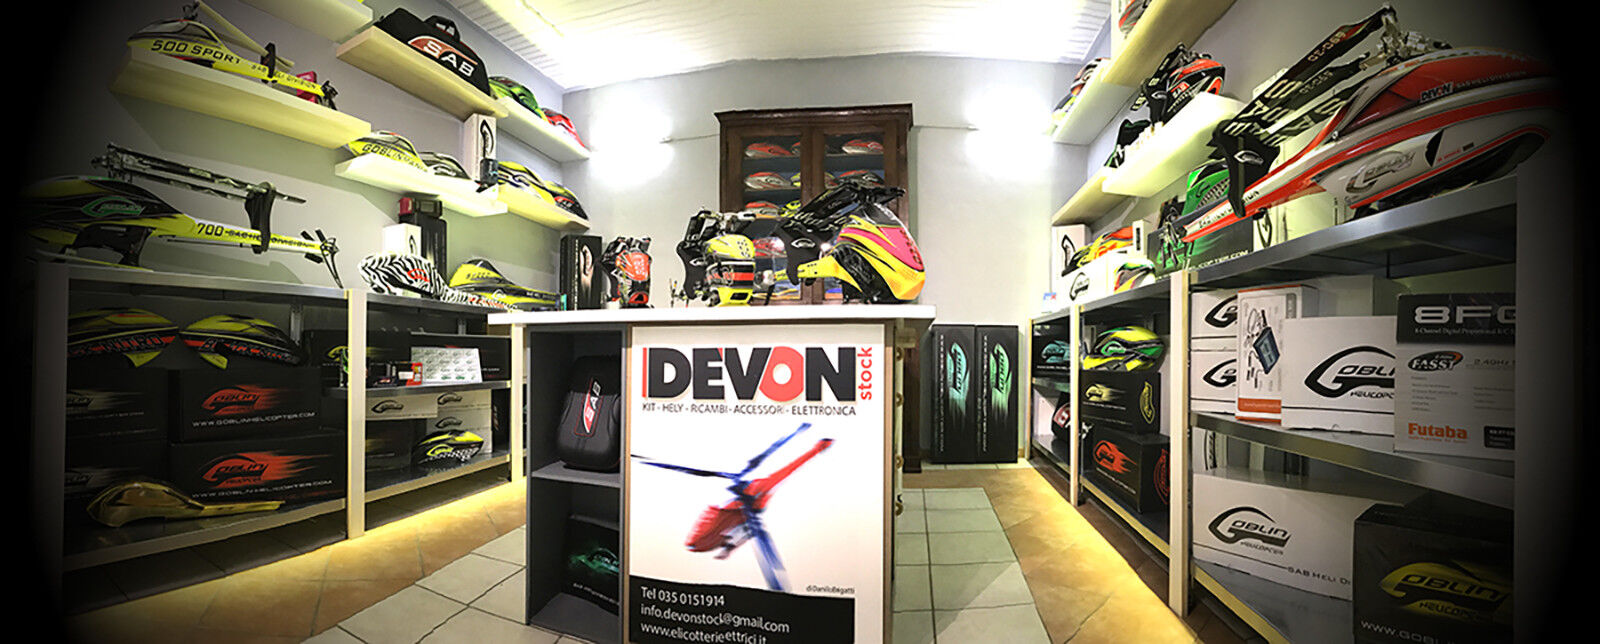 Elicotteri-Elettrici Rc Devon-Stock